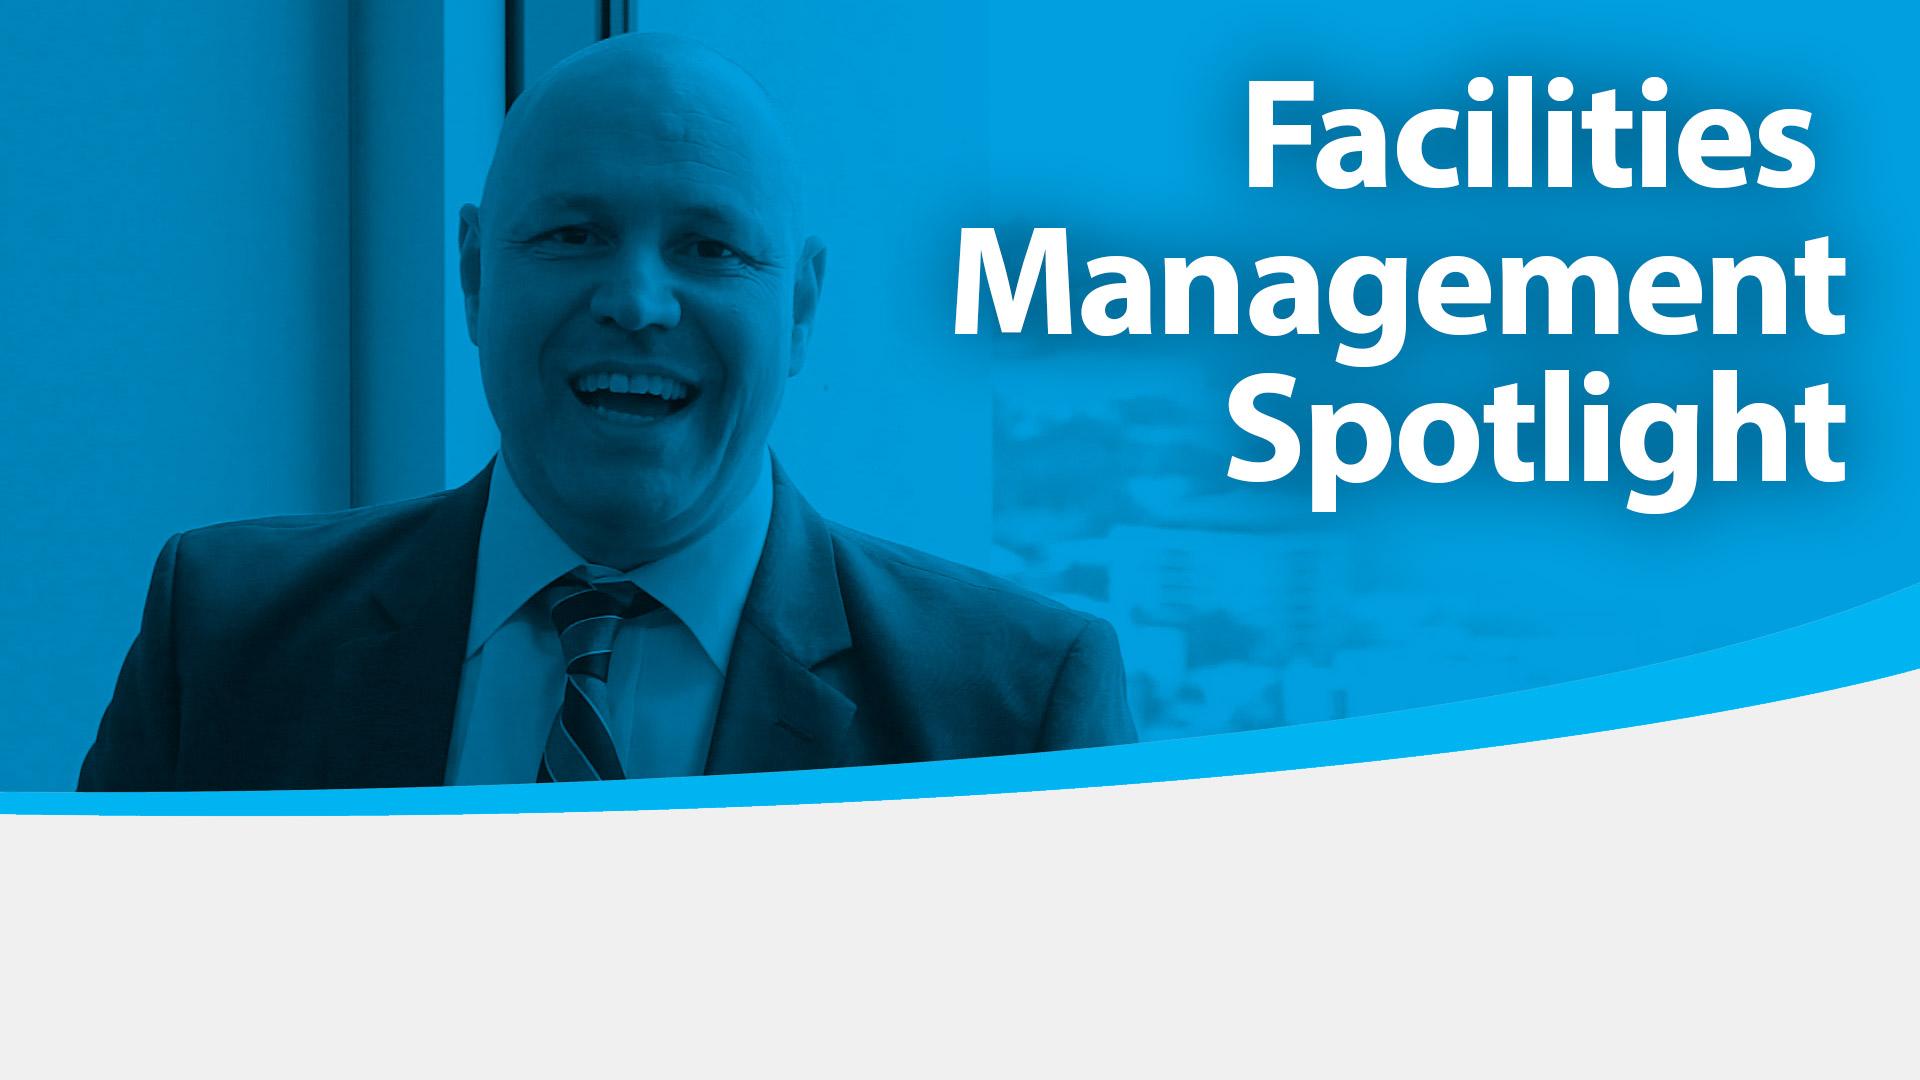 Tony Mangraviti, deputy general manager at Building Facilities Management Solutions (BFMS)